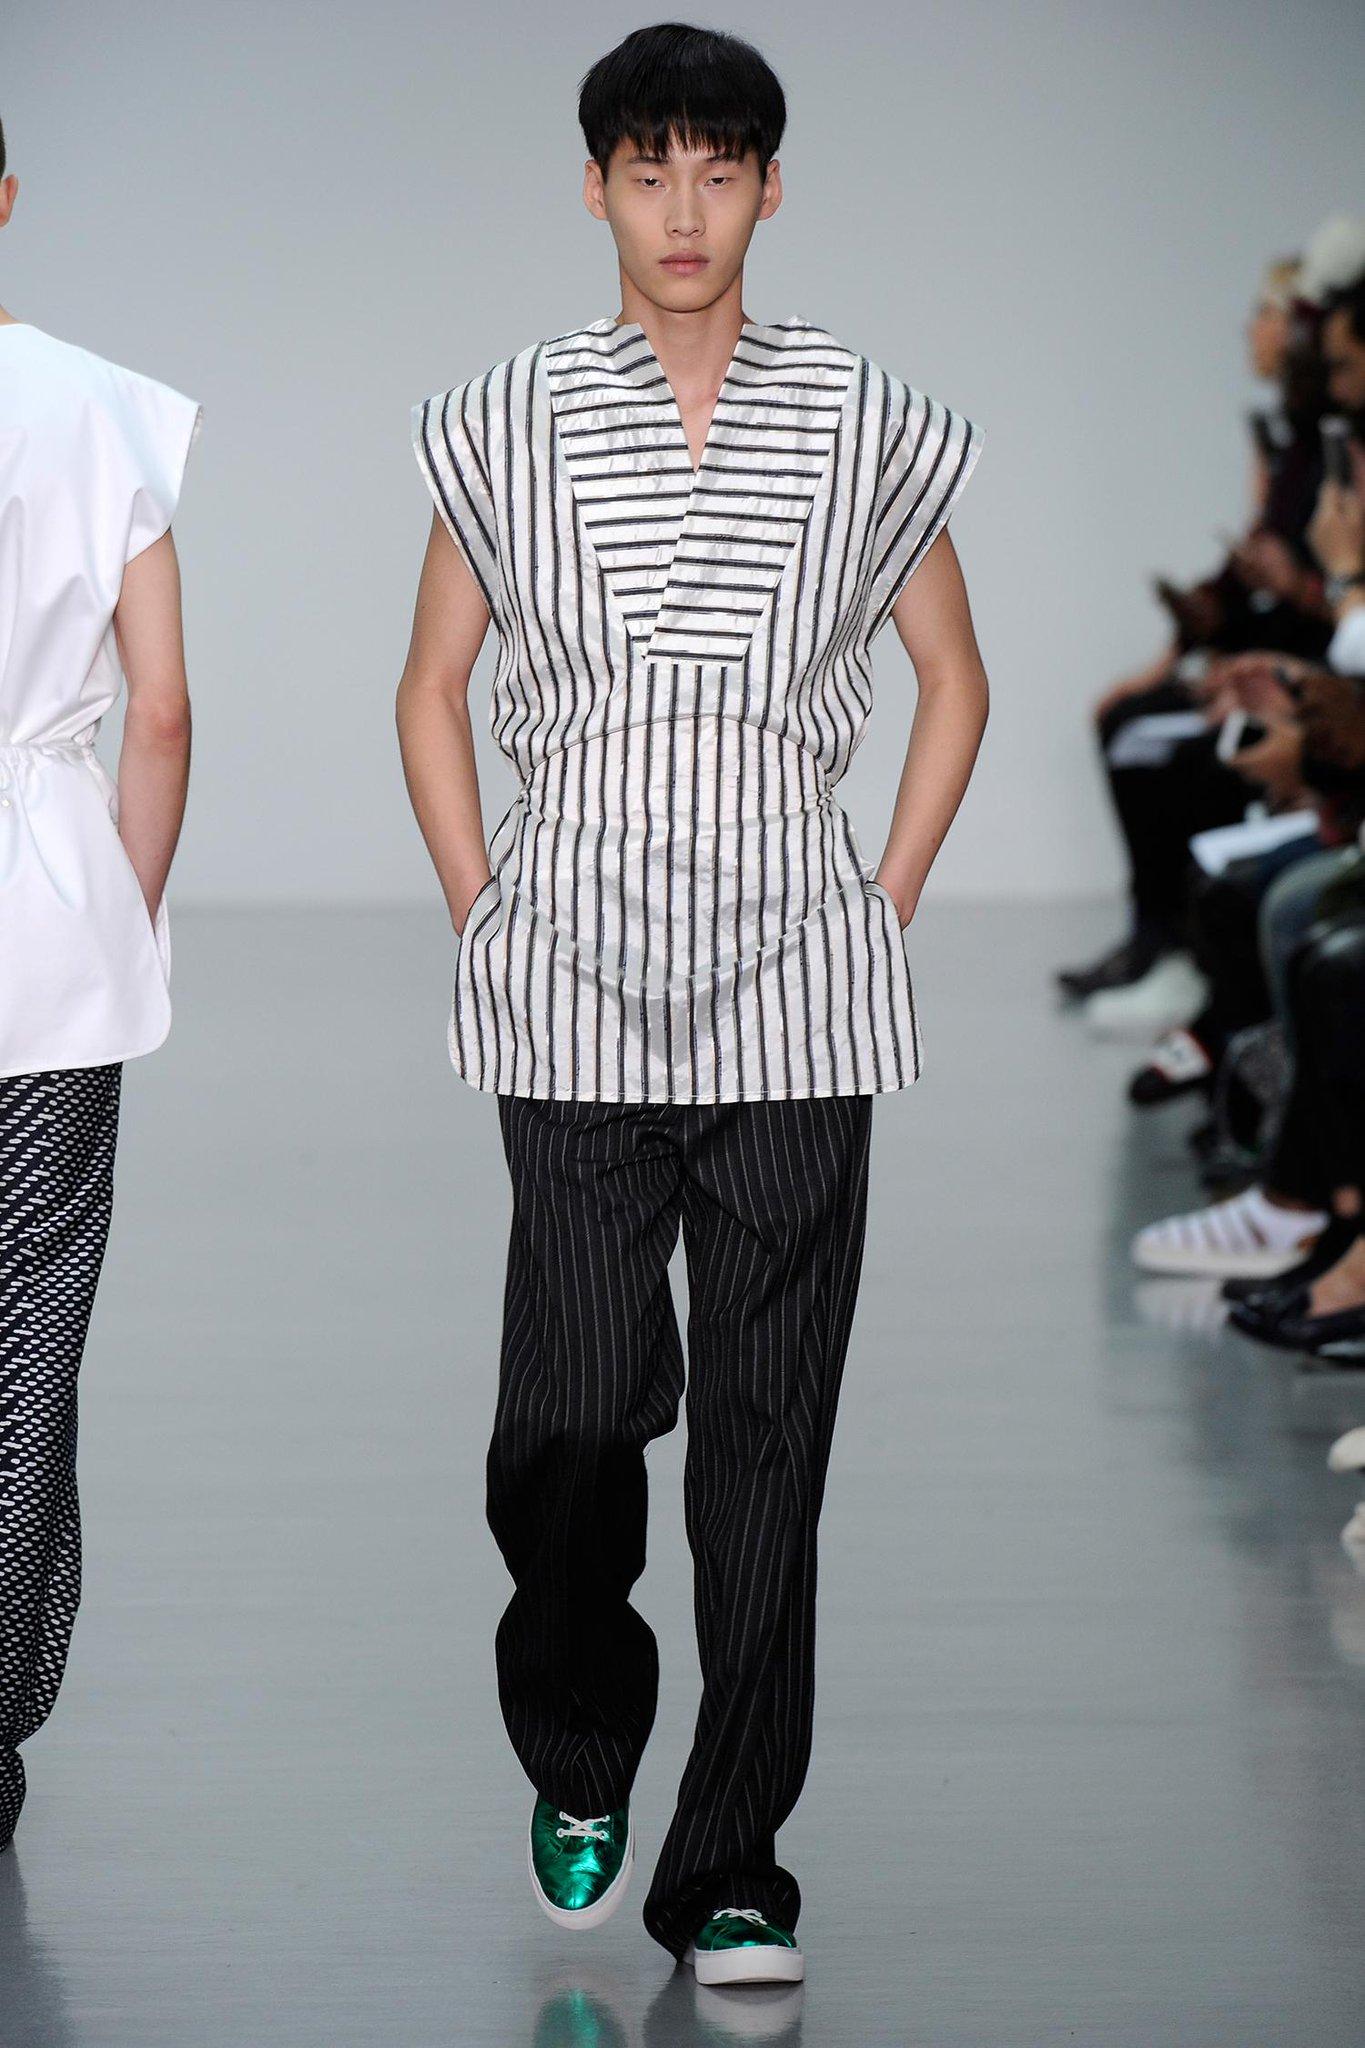 EXCLUSIVE: Totem Fashion London and Paris represent Sean Suen http://t.co/prmPmbcITU @TOTEM_Fashion http://t.co/XPqYzJbkpK